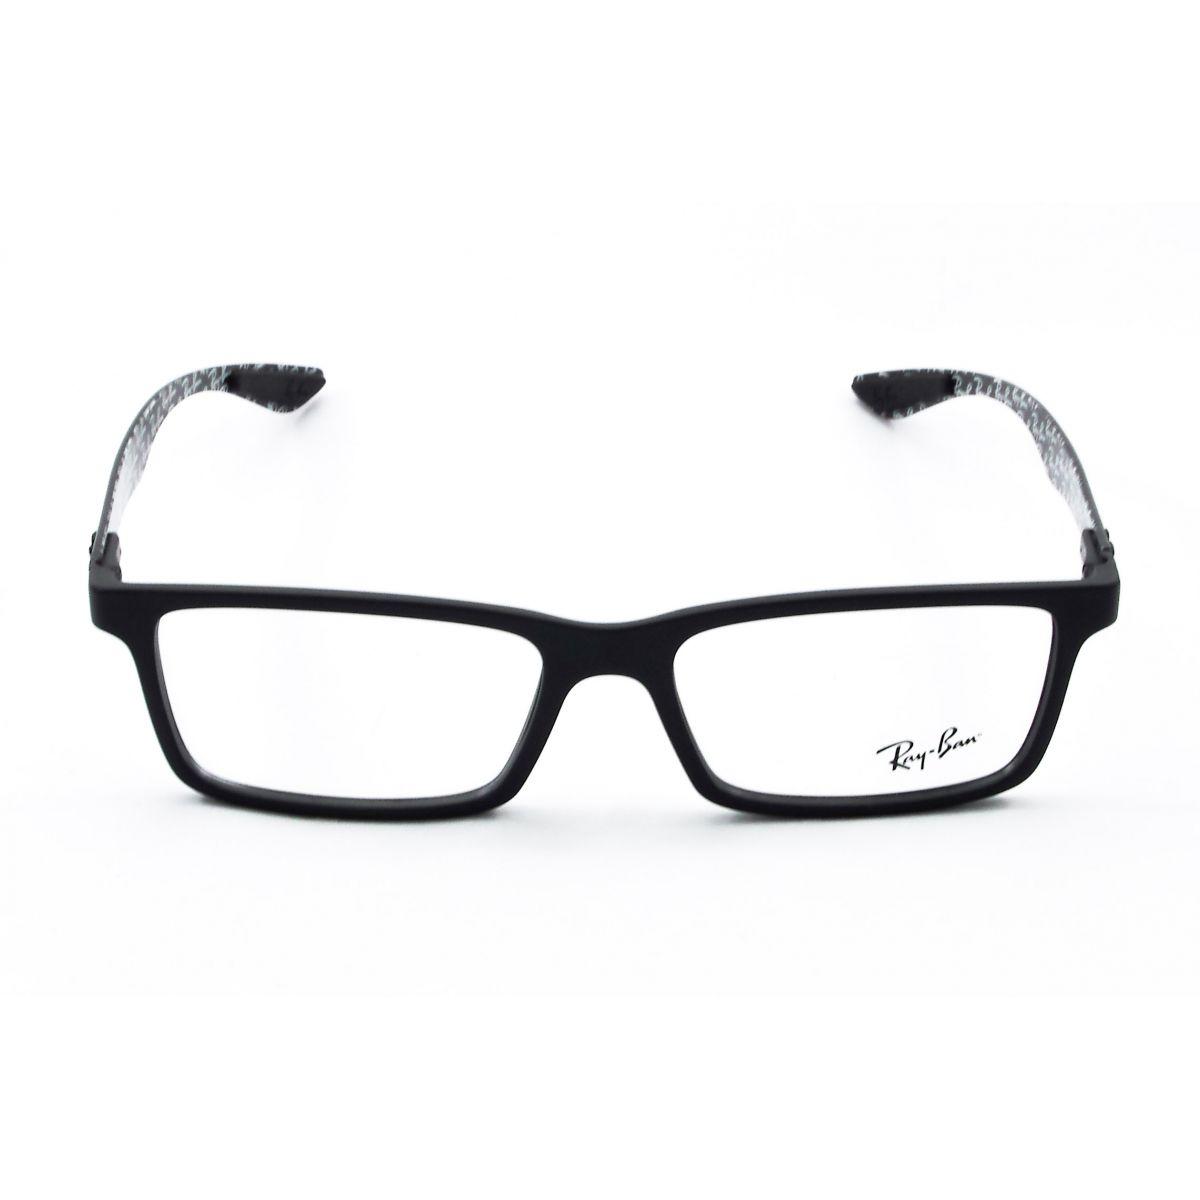 Oculos Rayban De Grau Feminino Preço   Louisiana Bucket Brigade f96b859c94